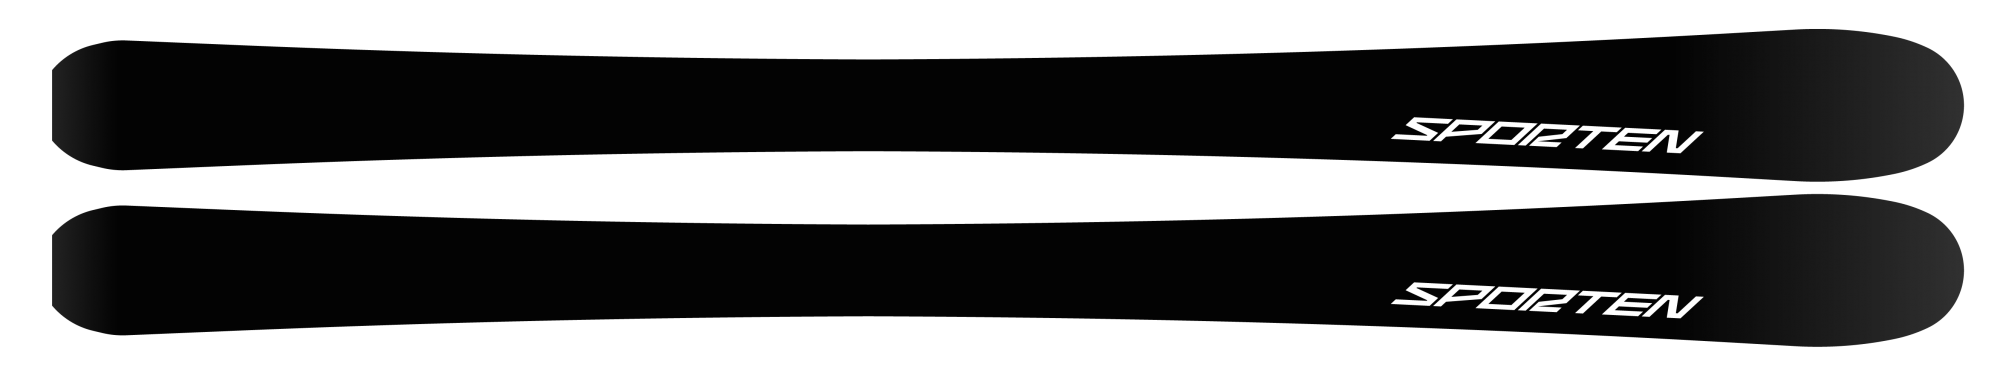 Sporten Iridium 4 2021.pngI.png